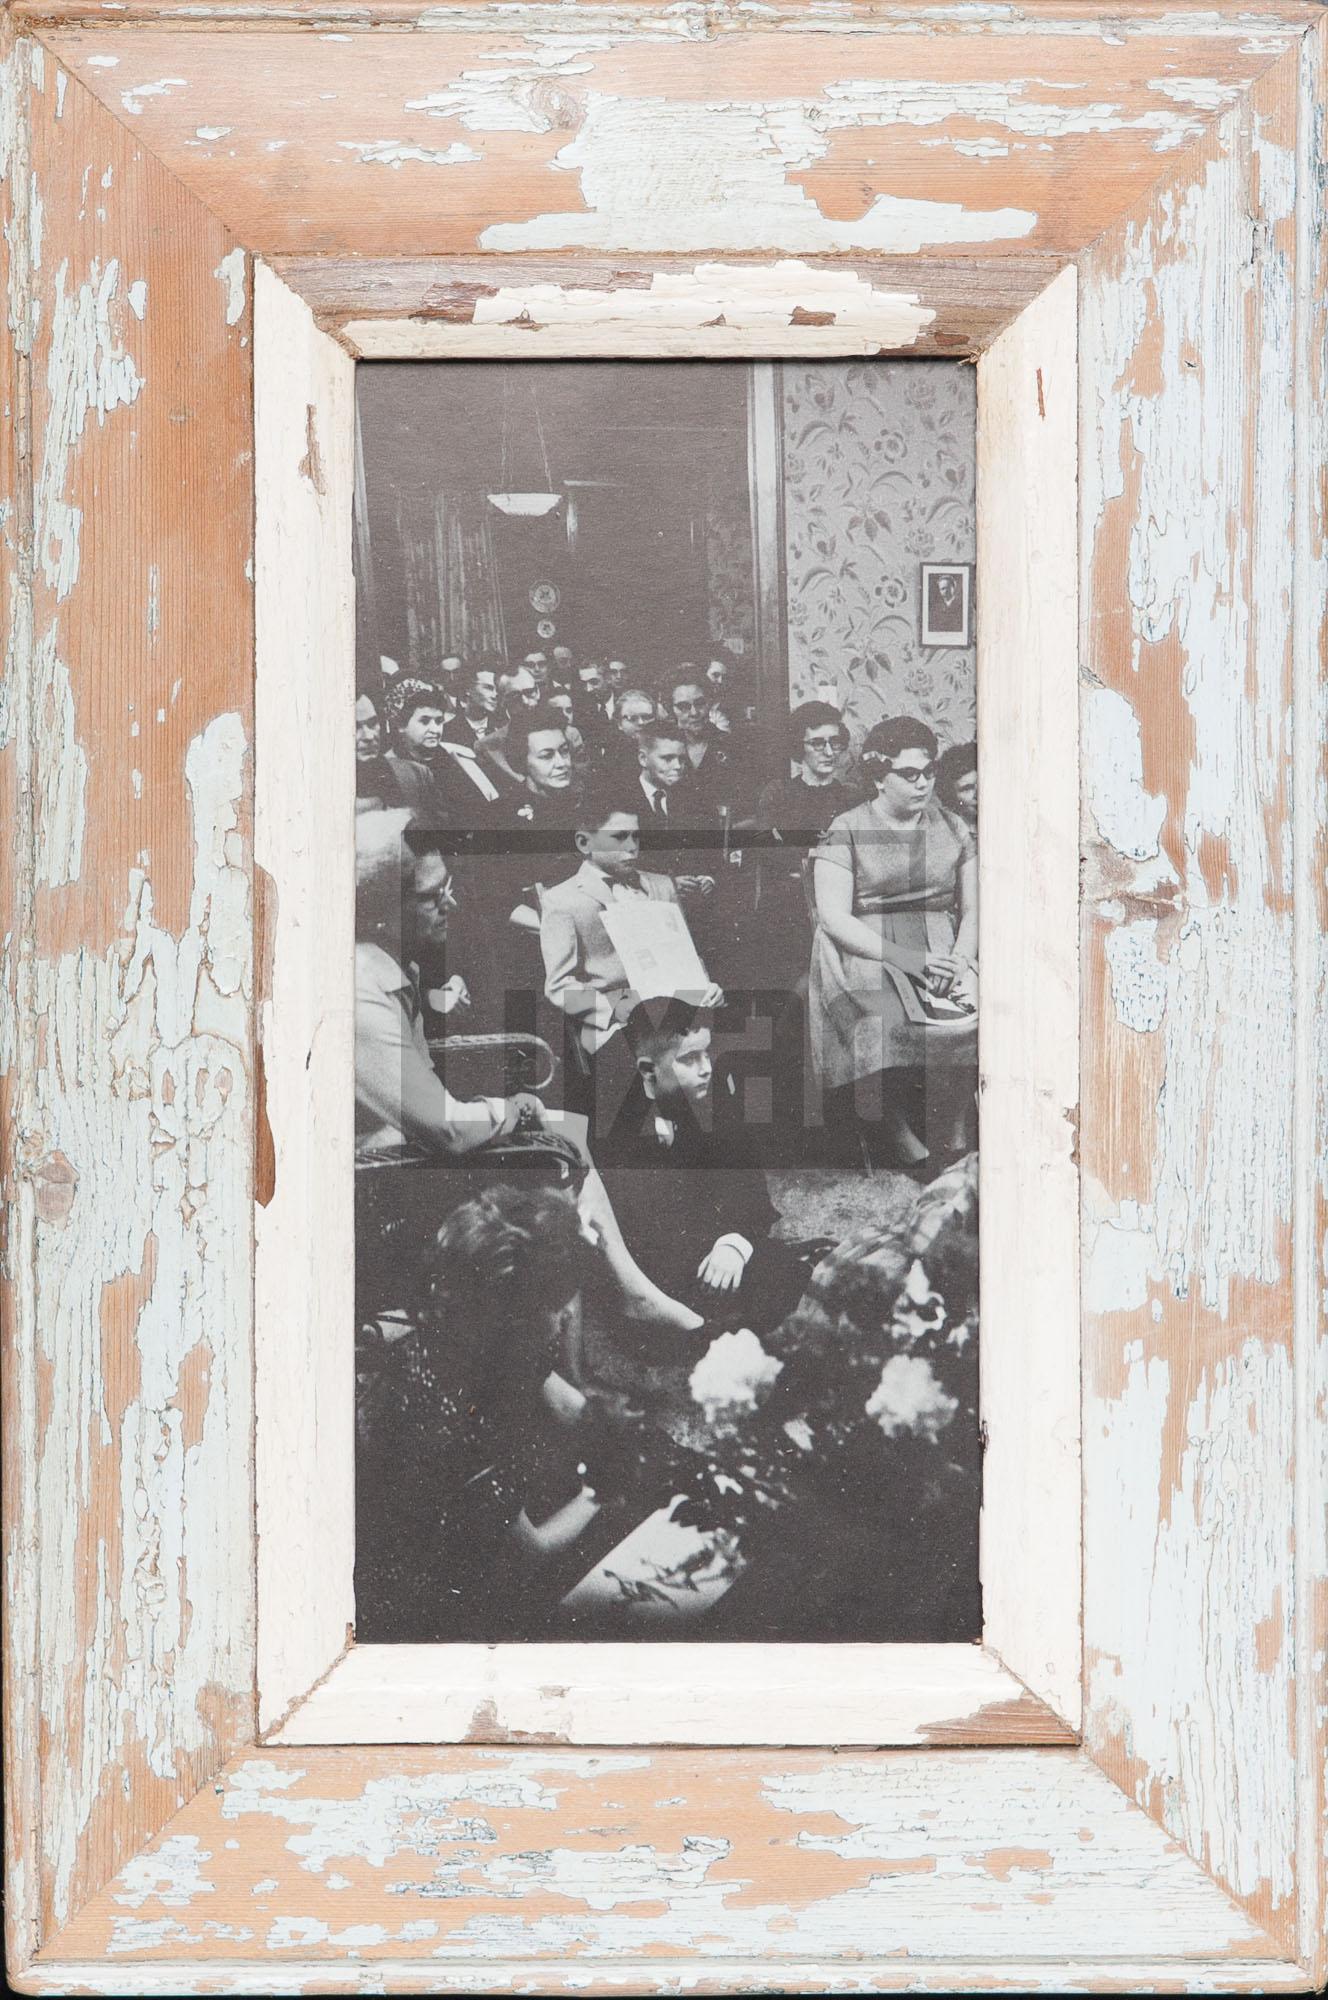 Panorama-Bilderrahmen aus altem Holz für Fotos ca. 15 x 29,7 cm